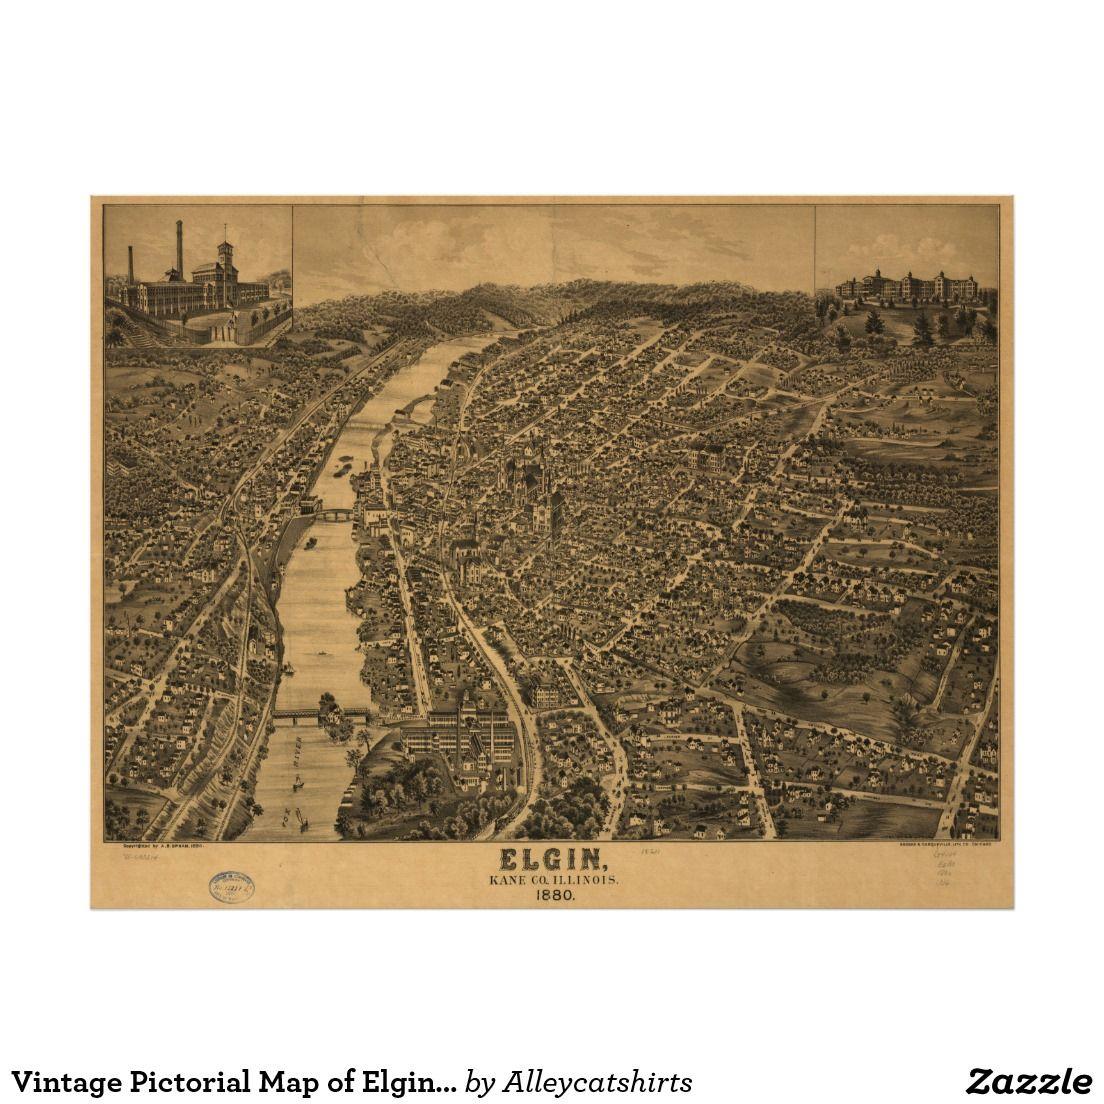 Illinois kane county carpentersville - Vintage Pictorial Map Of Elgin Illinois 1880 Poster